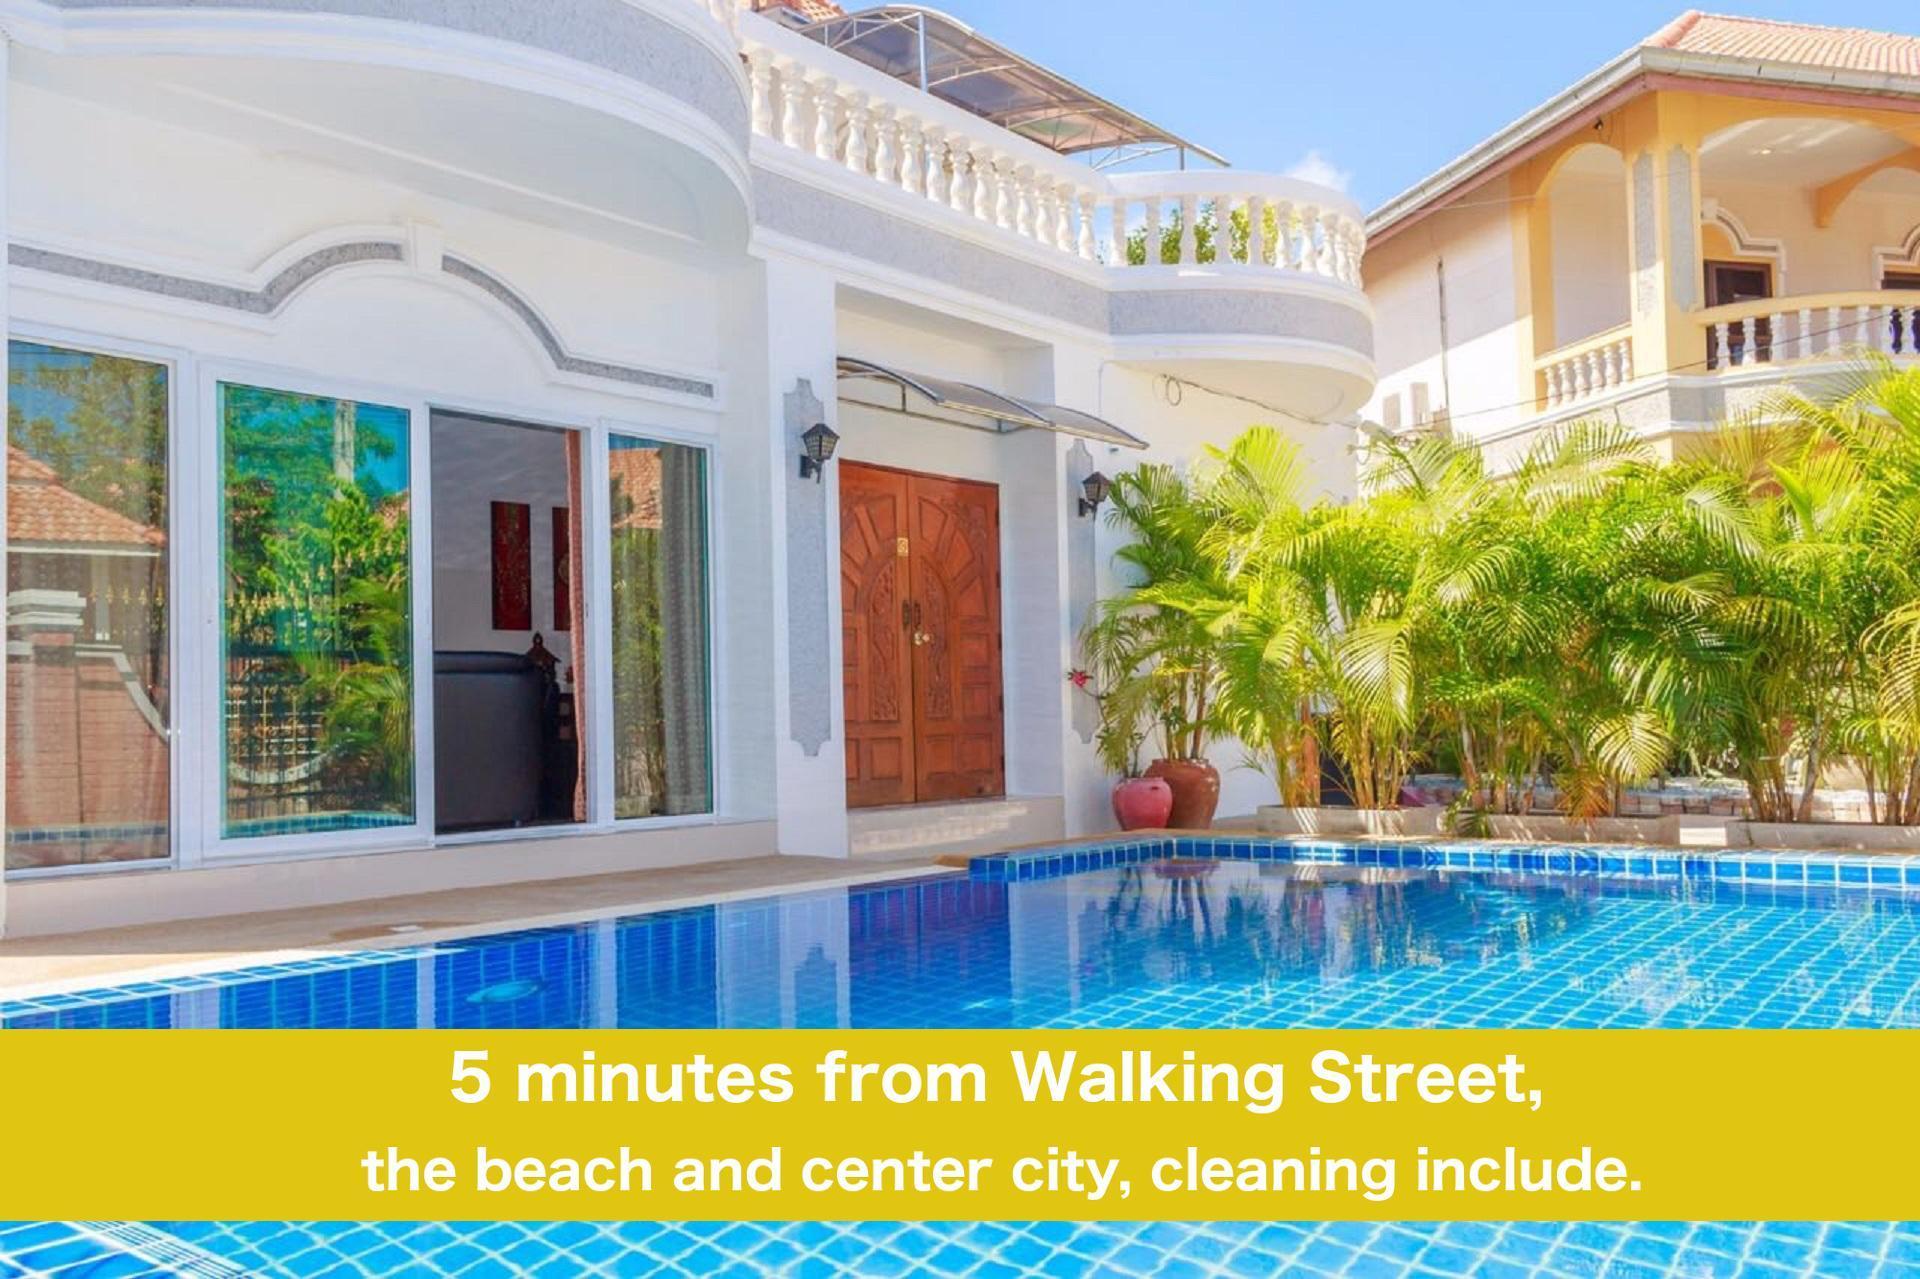 Pool Villa 6 Bedrooms 5 Min Walking Street And Beach